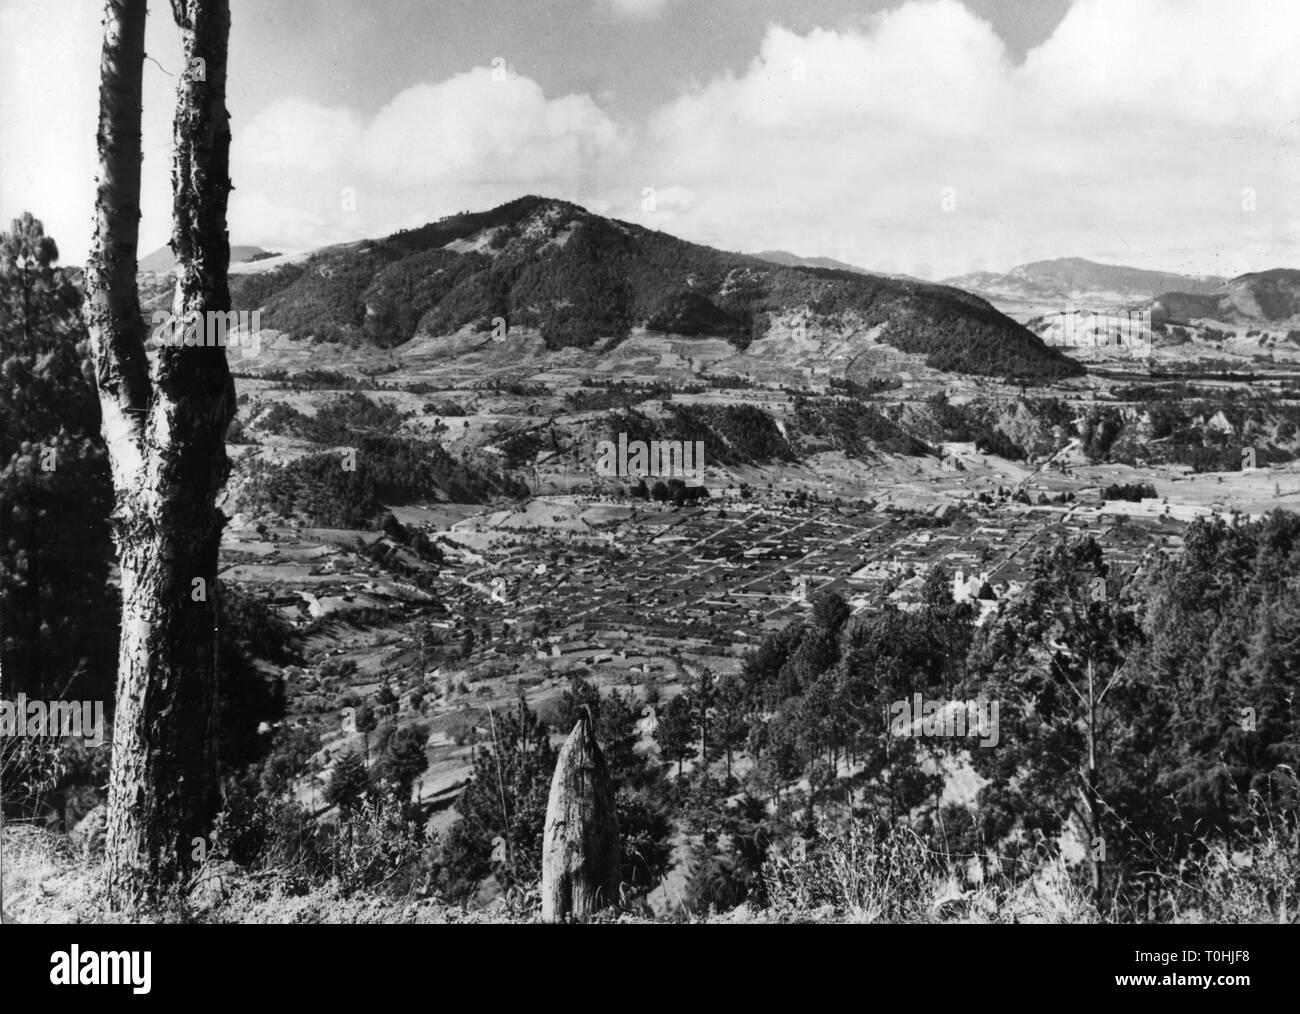 Geographie/Reisen, Guatemala, Totonicapan, Blick auf die Stadt/Stadtansichten, 1960er Jahre, Additional-Rights - Clearance-Info - Not-Available Stockbild